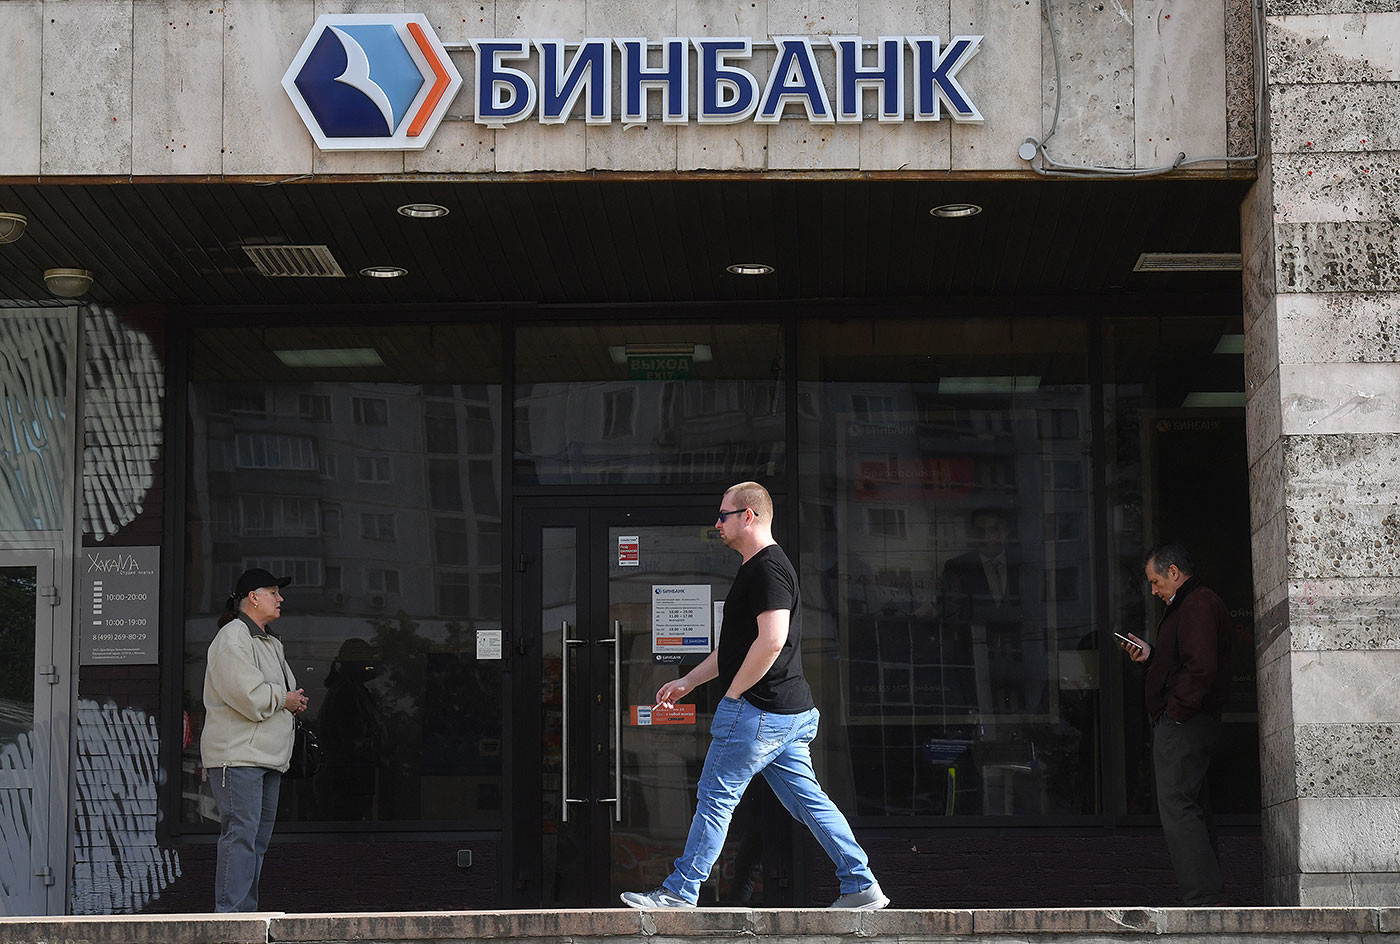 Фото: © РИА Новости / Алексей Куденко